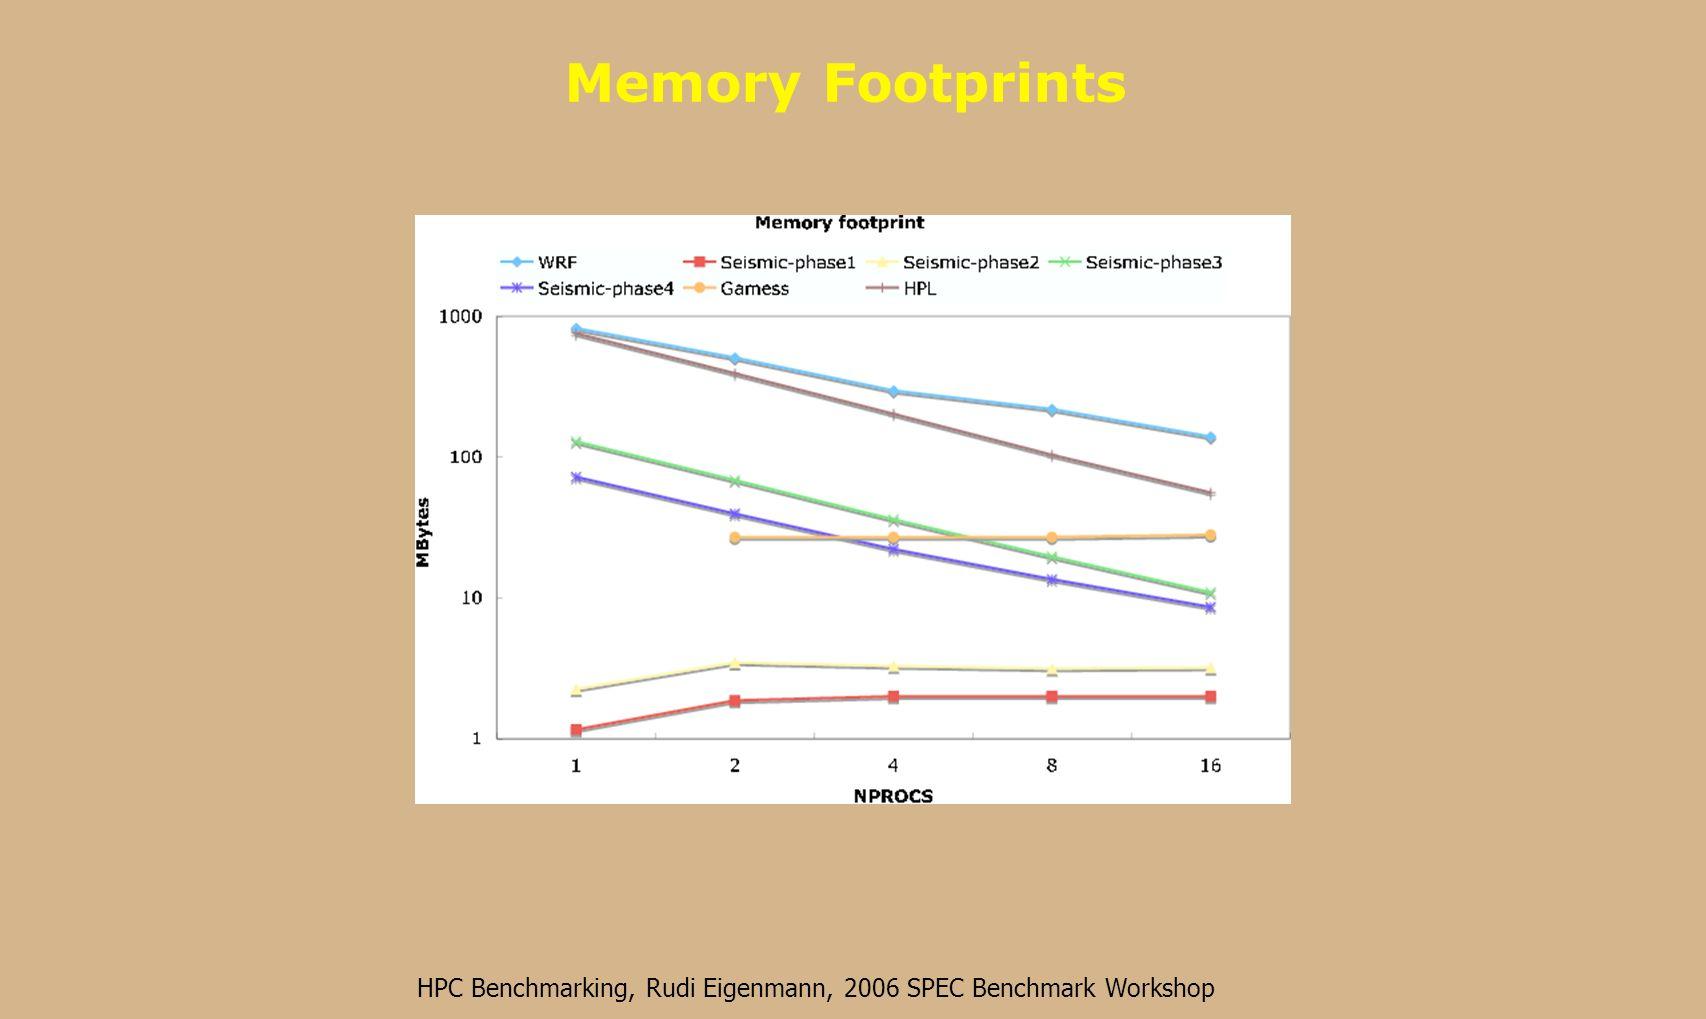 HPC Benchmarking, Rudi Eigenmann, 2006 SPEC Benchmark Workshop I/O Volume, Time, and Effective Bandwidth